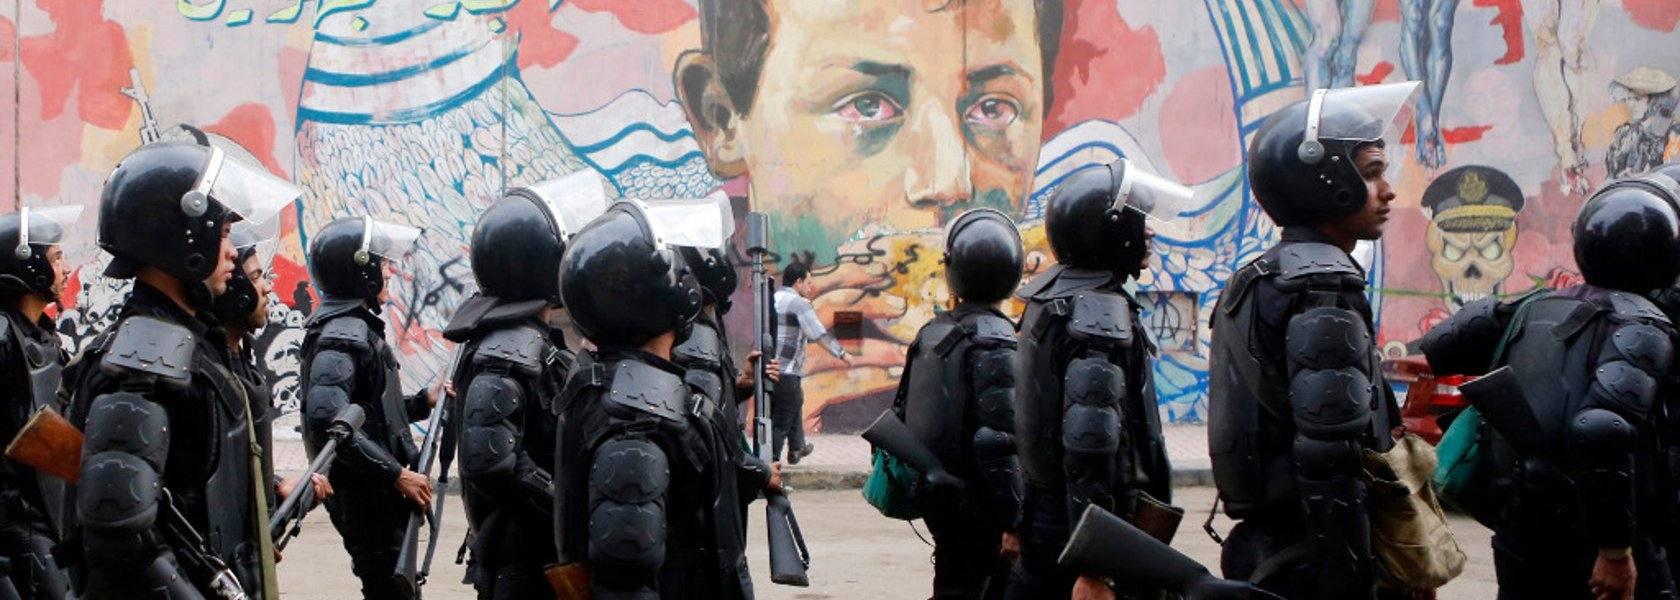 Stifling-Egyptian-civil-society